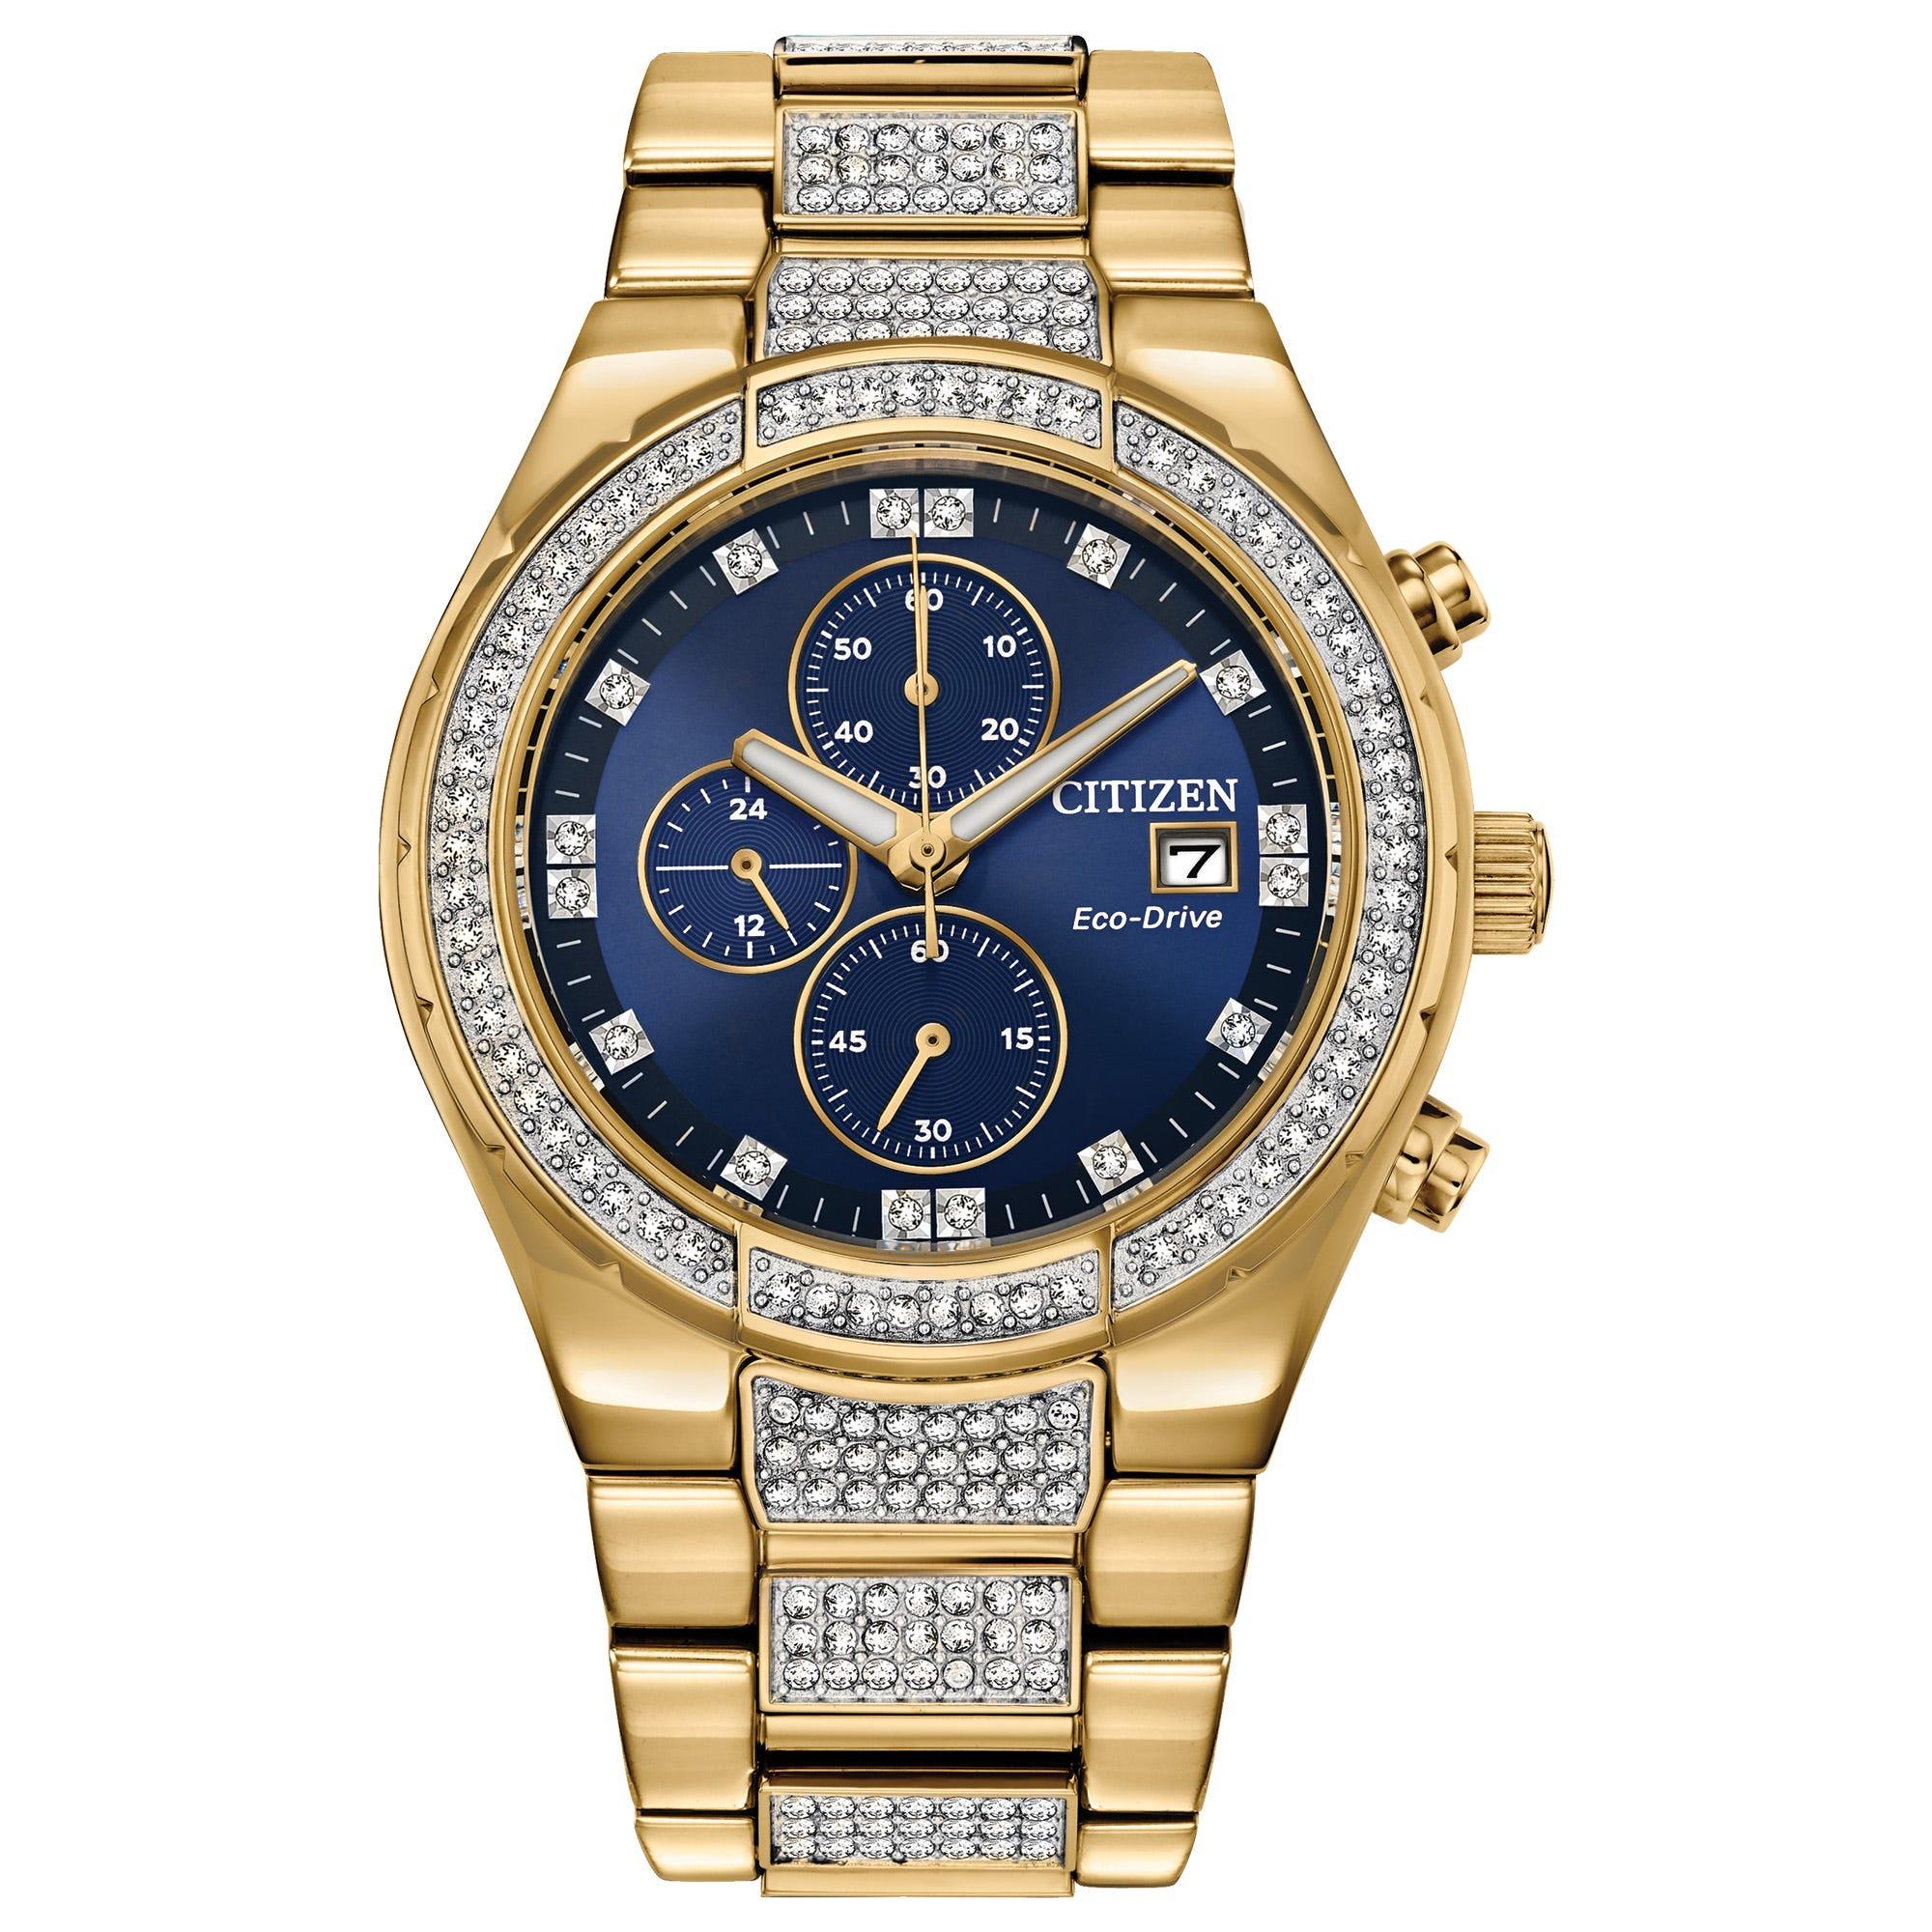 Citizen Men's Eco-Drive Crystal Watch CA0752-58L